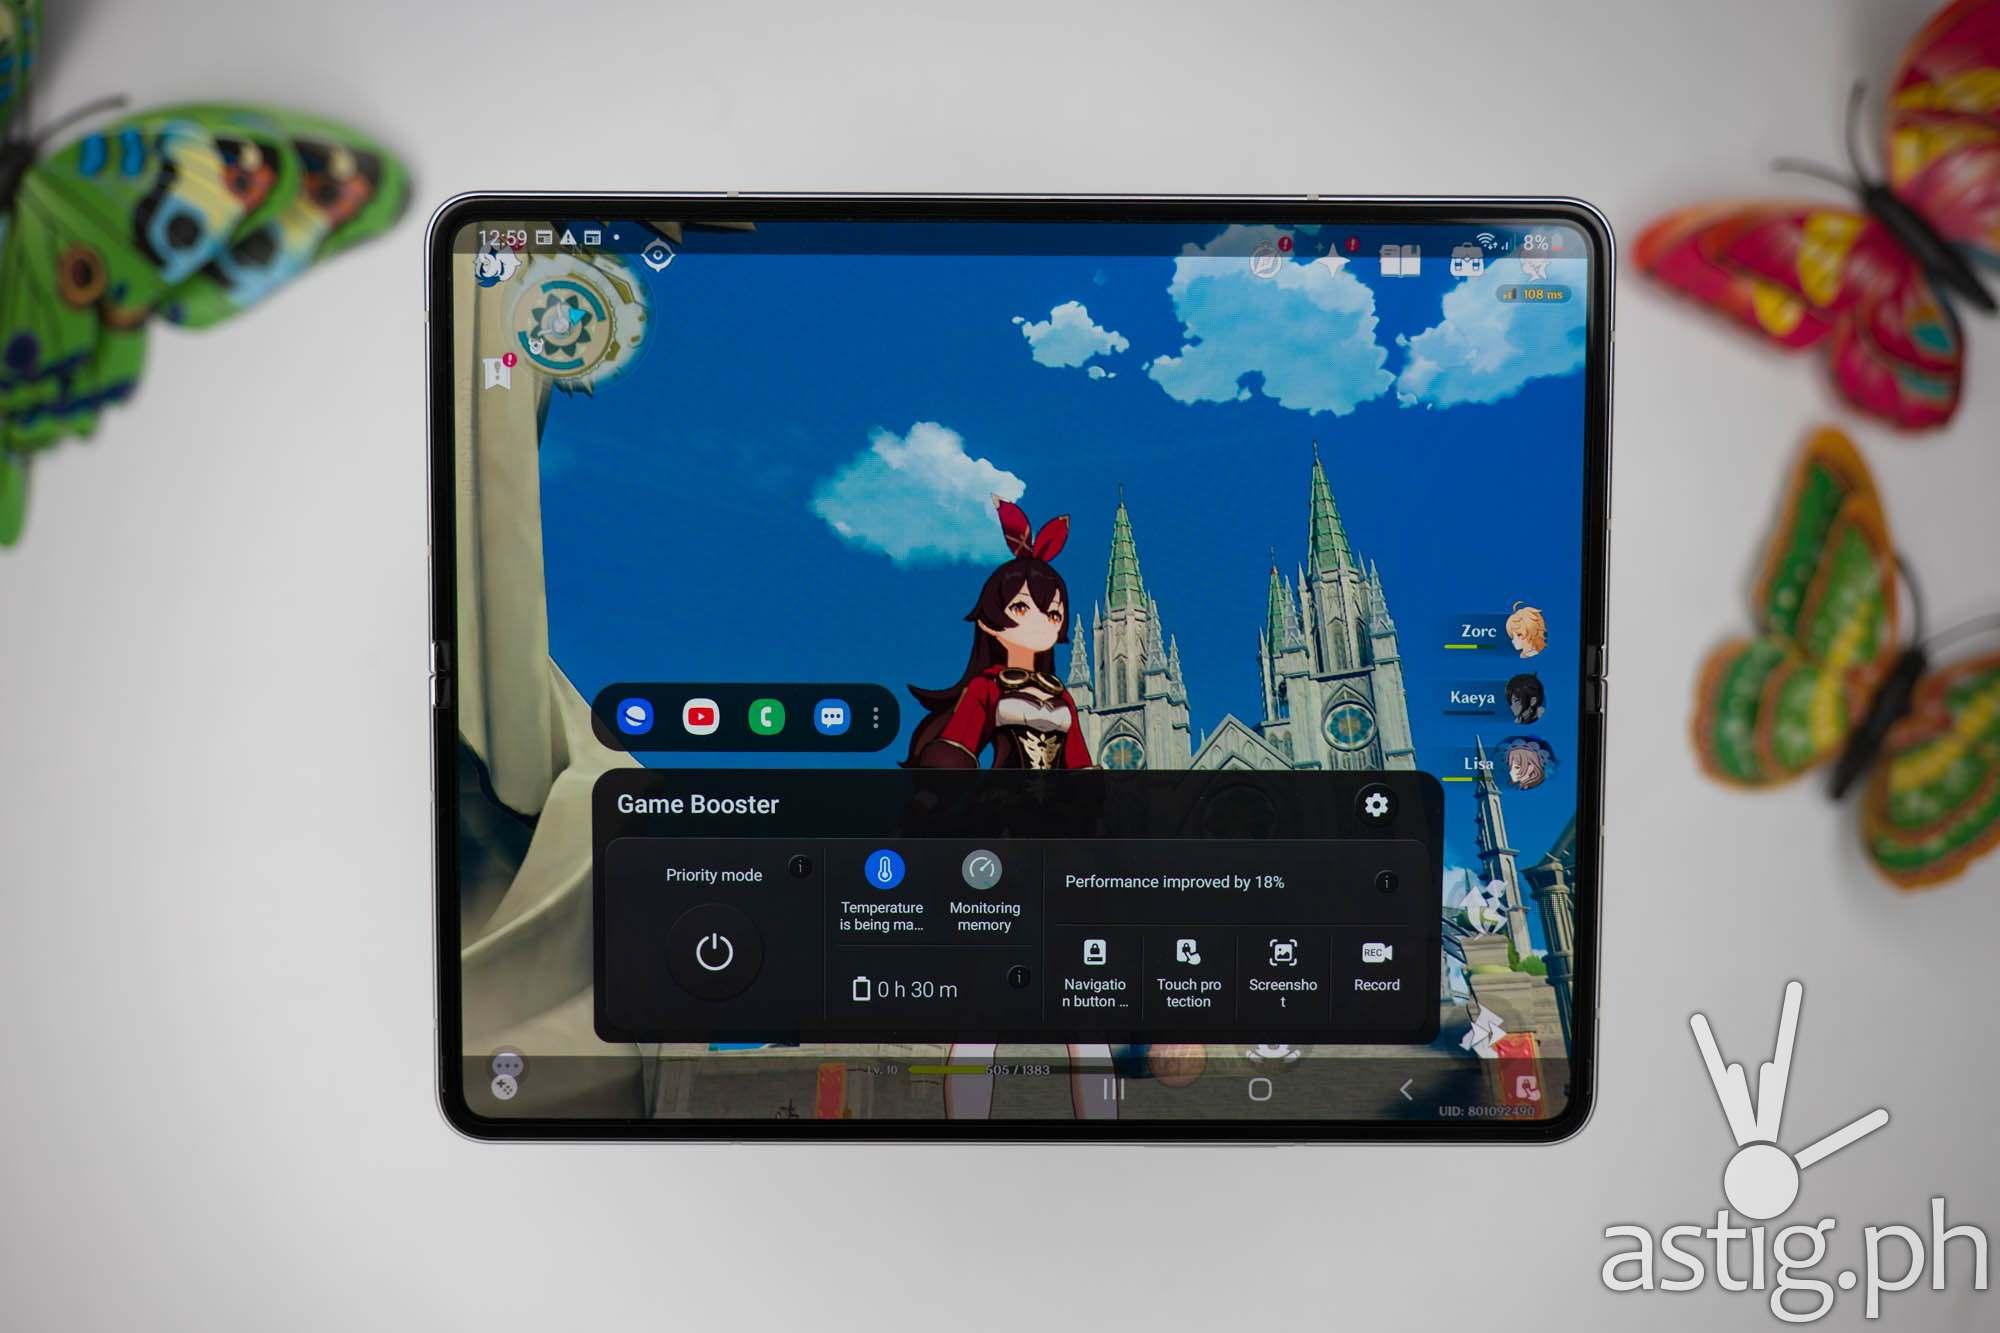 SAMSUNG Game Booster - SAMSUNG Galaxy Z Fold3 5G (Philippines)